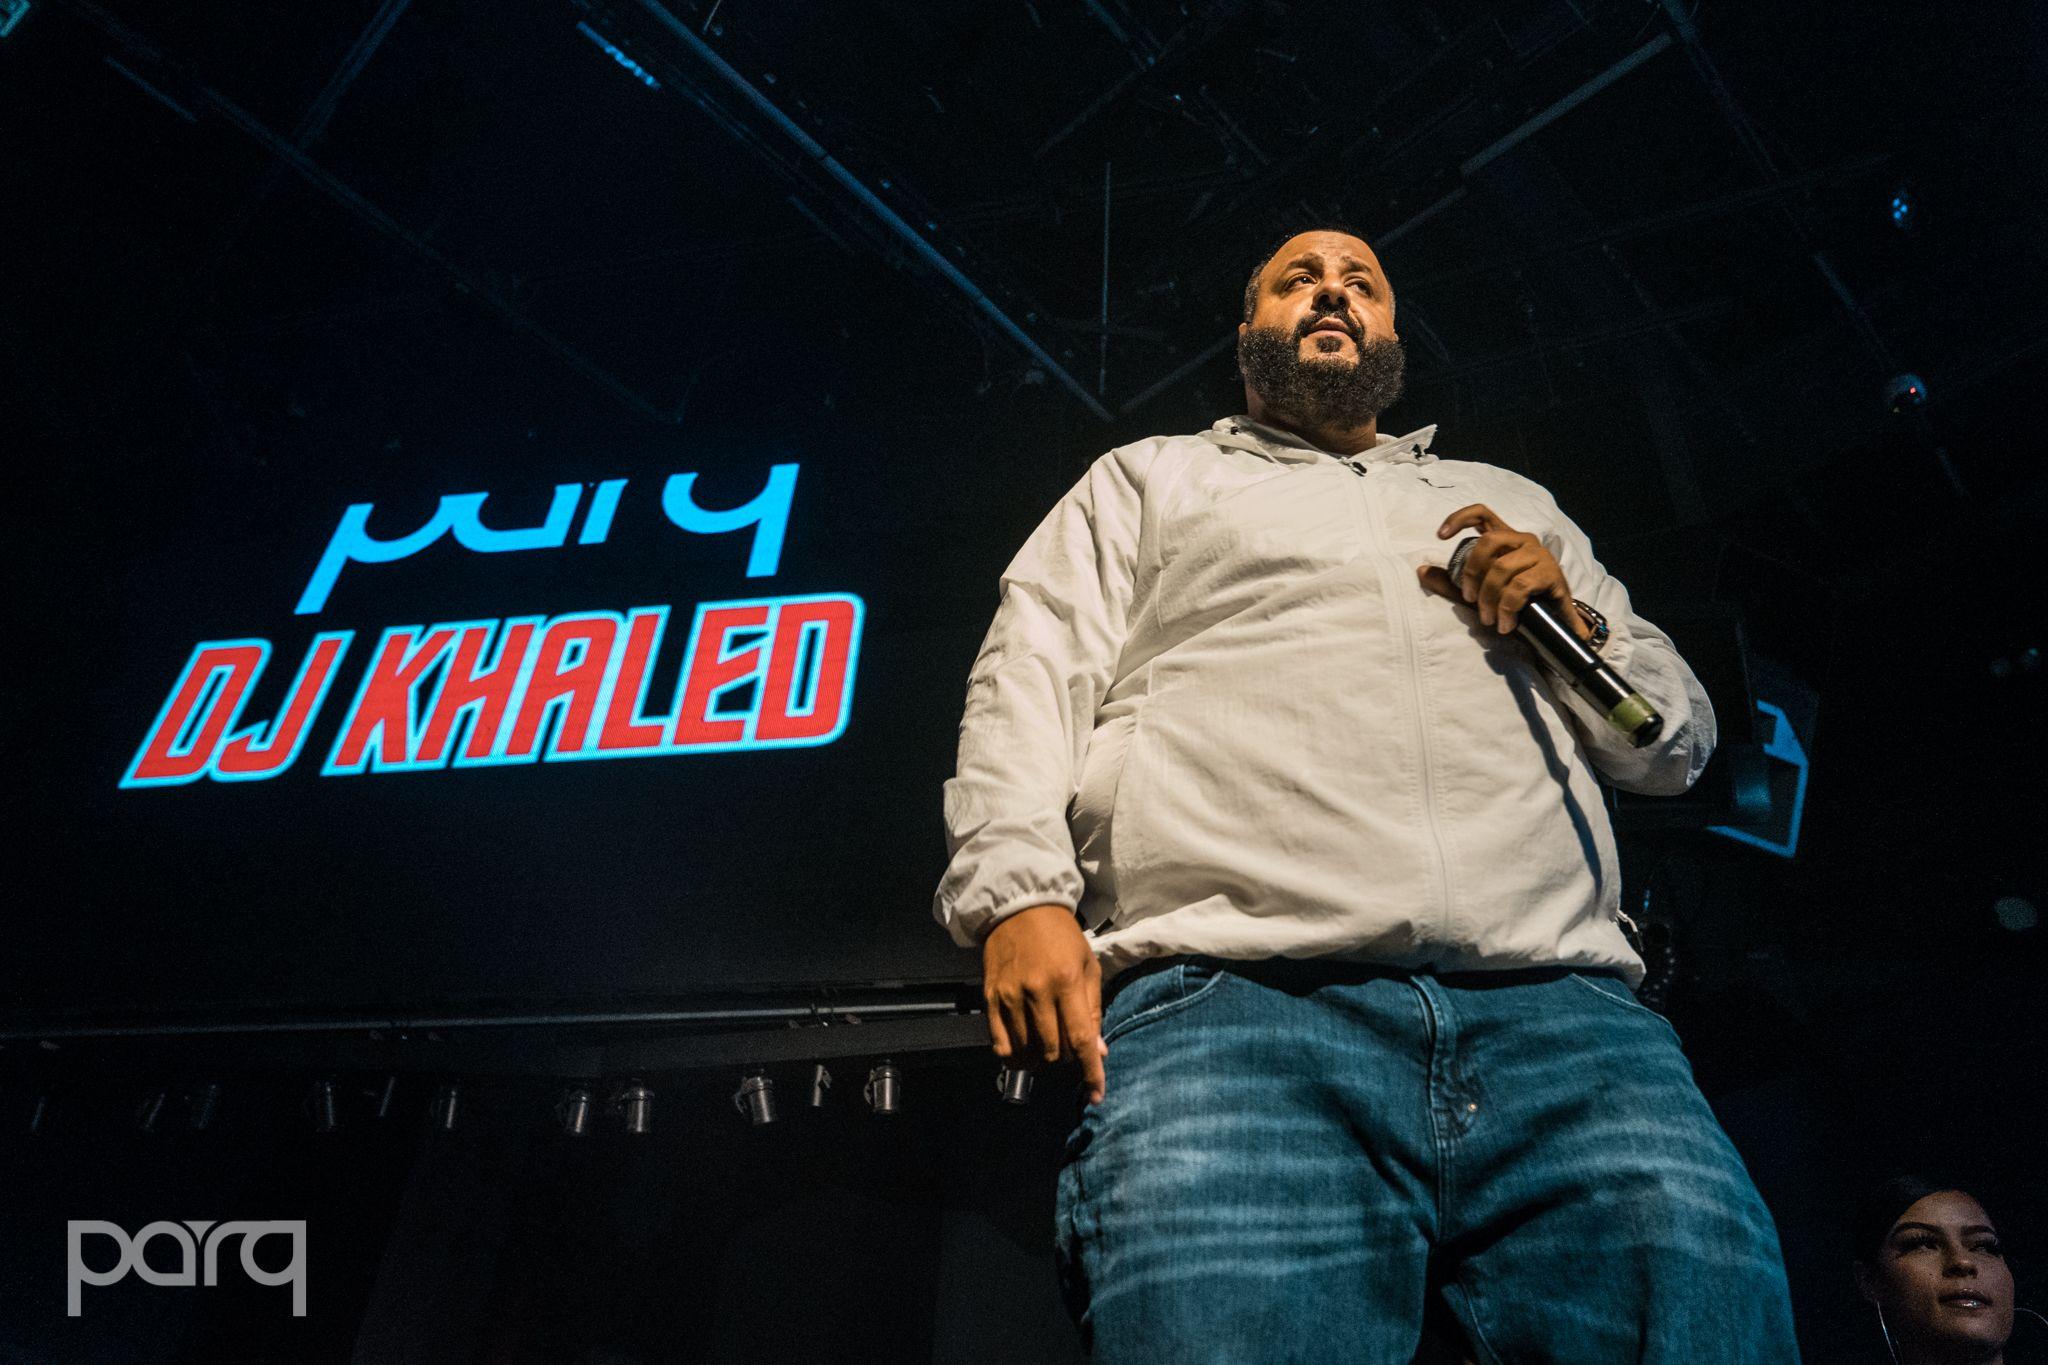 09.27.18 Parq - DJ Khaled-22.jpg